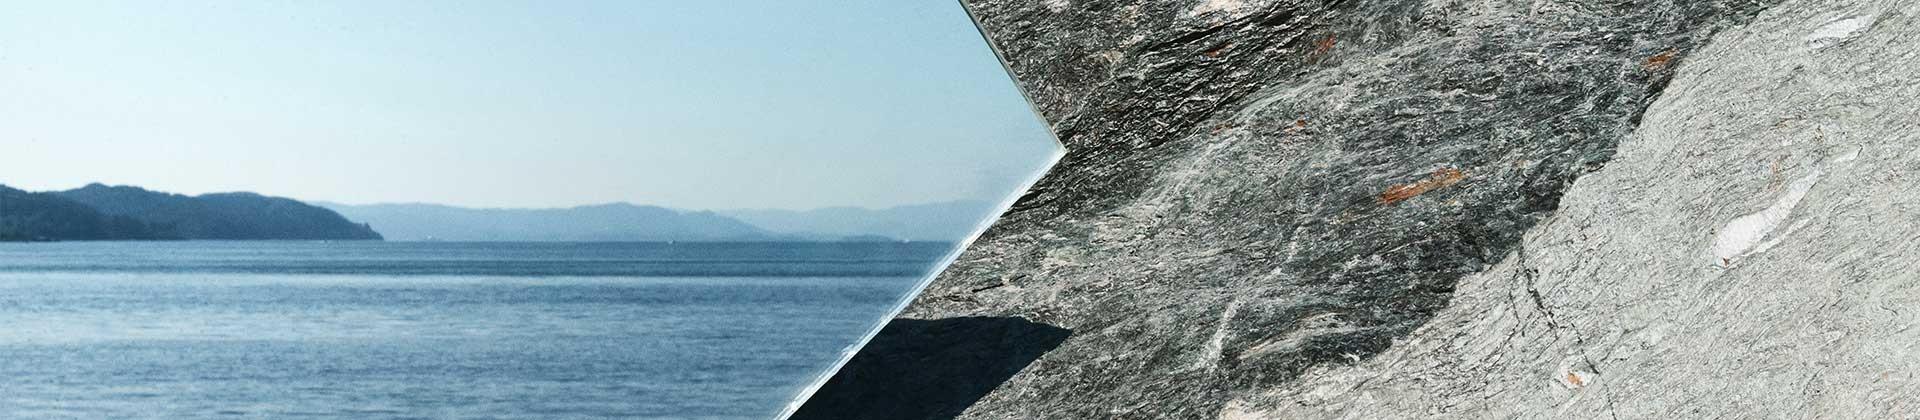 Norway mirror